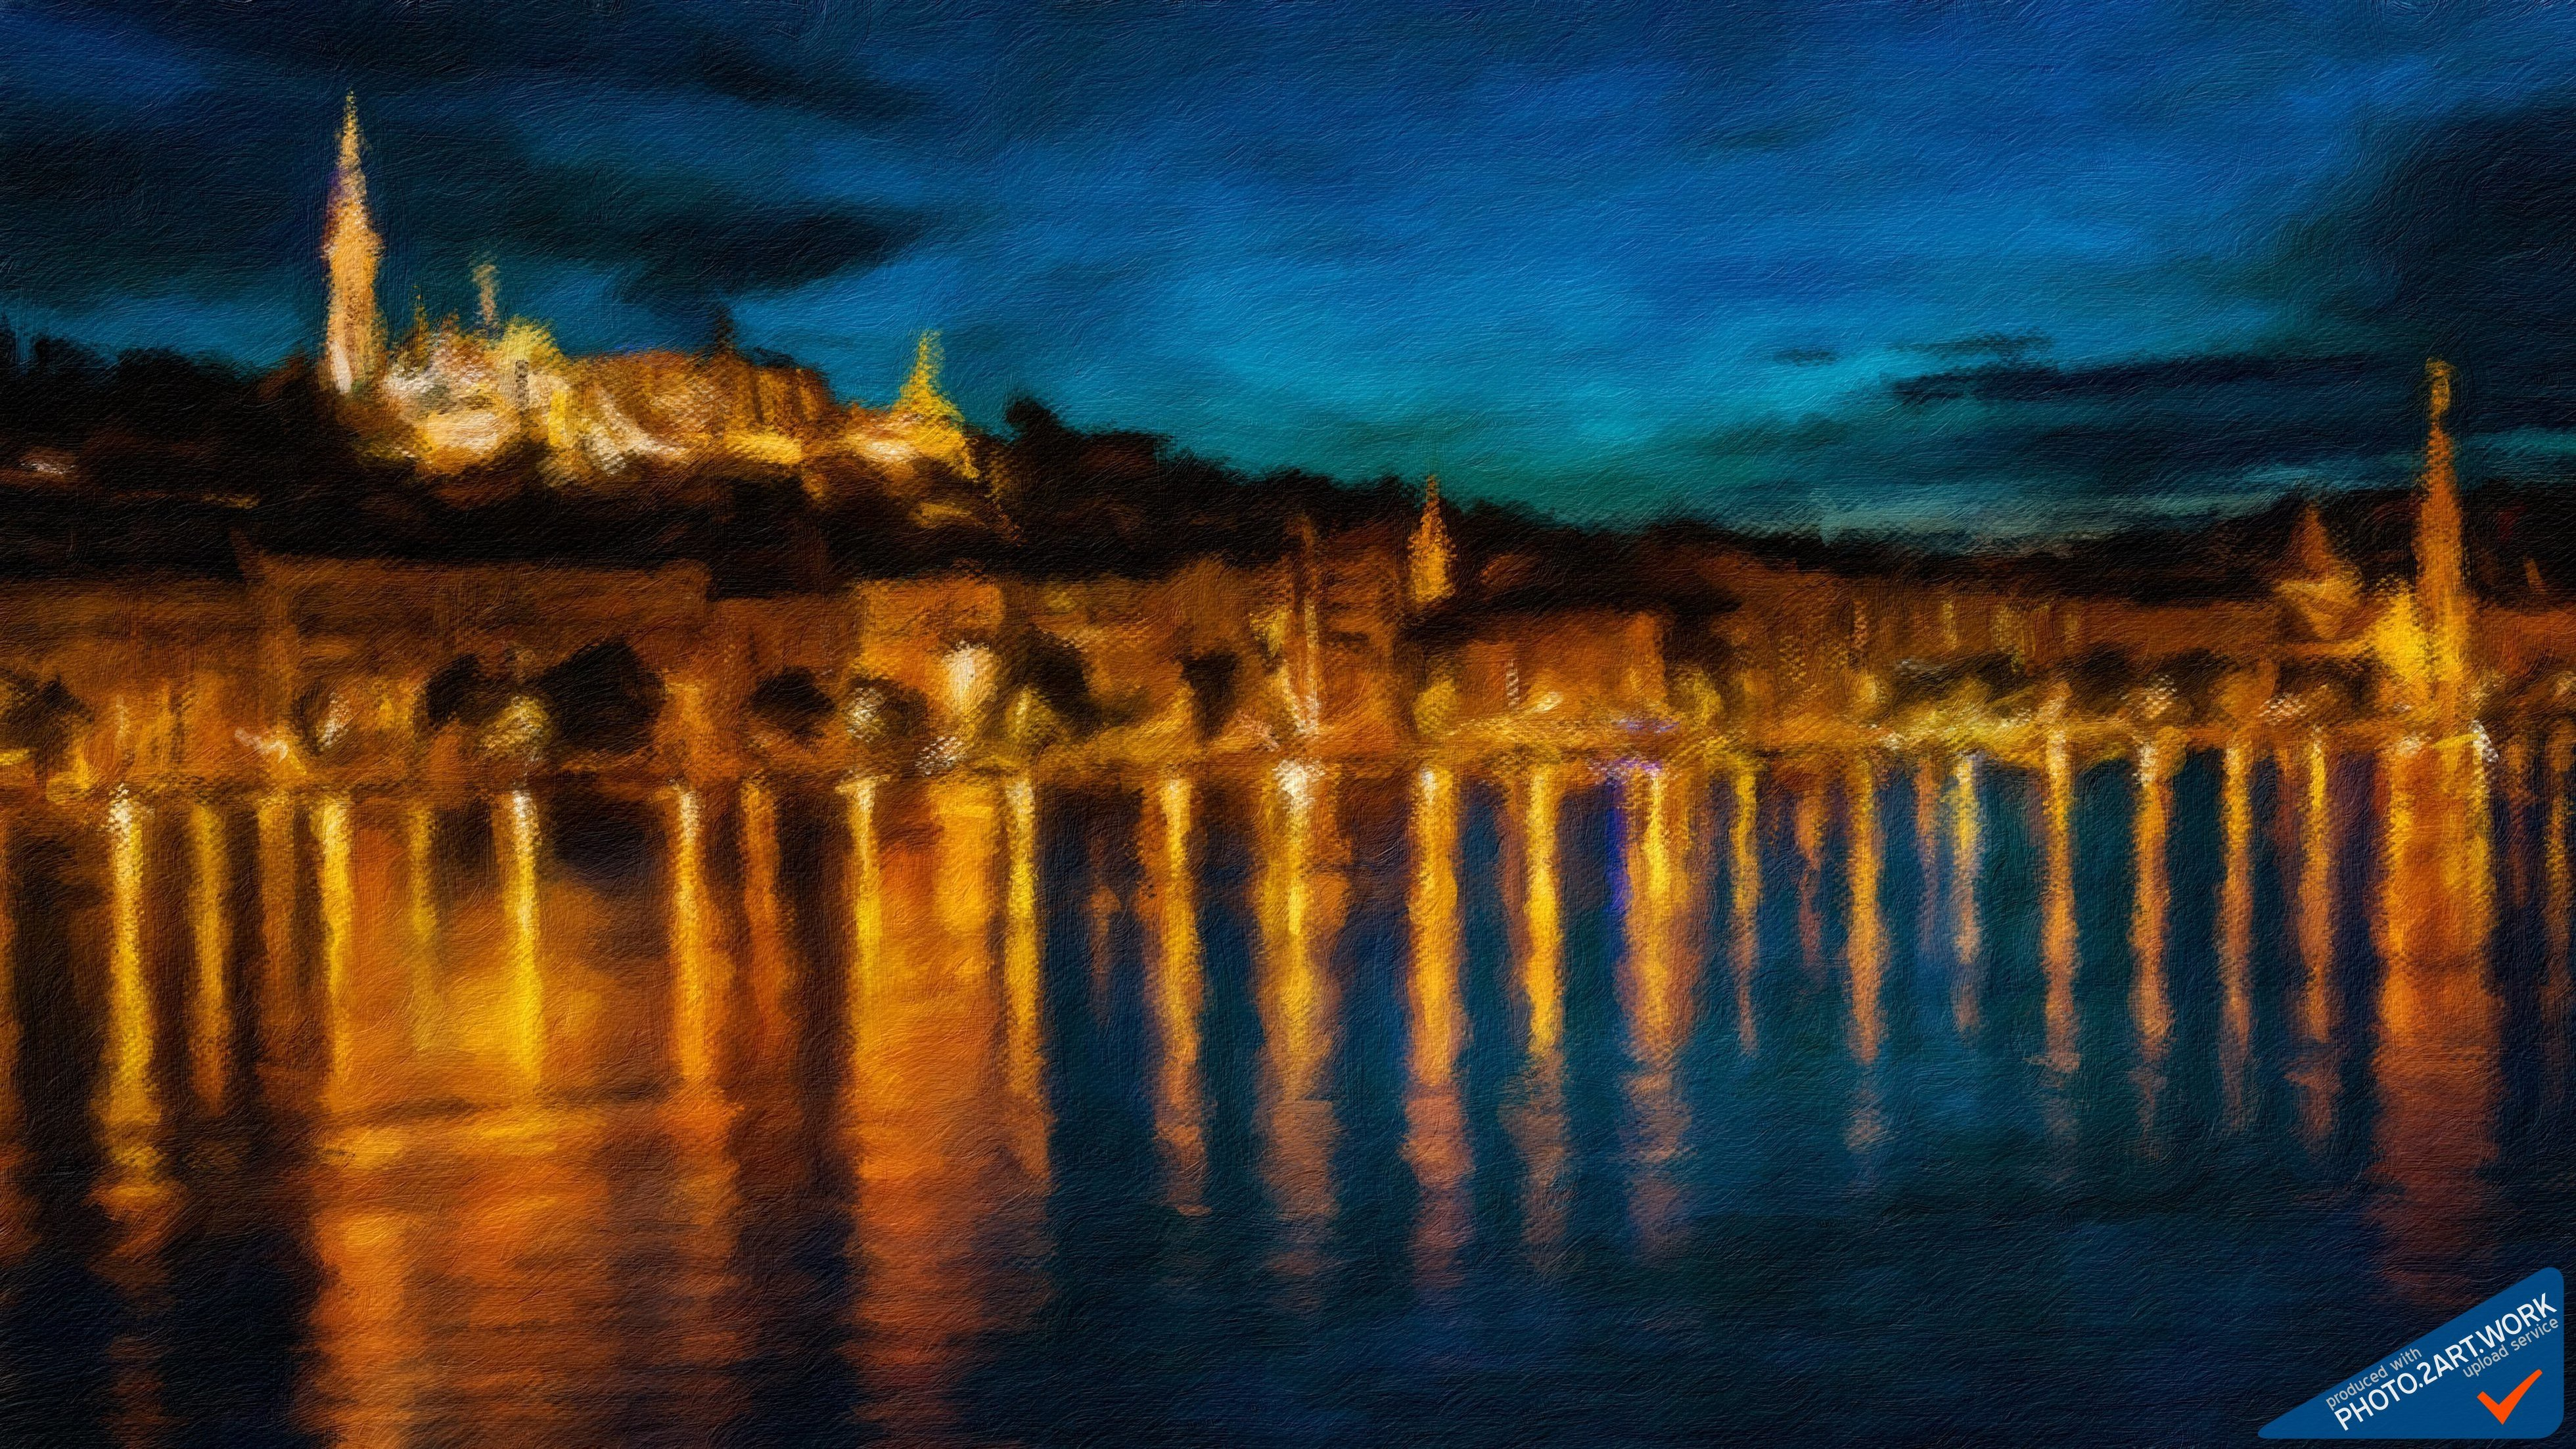 Budapest - id: 16236-105001-1122 photo